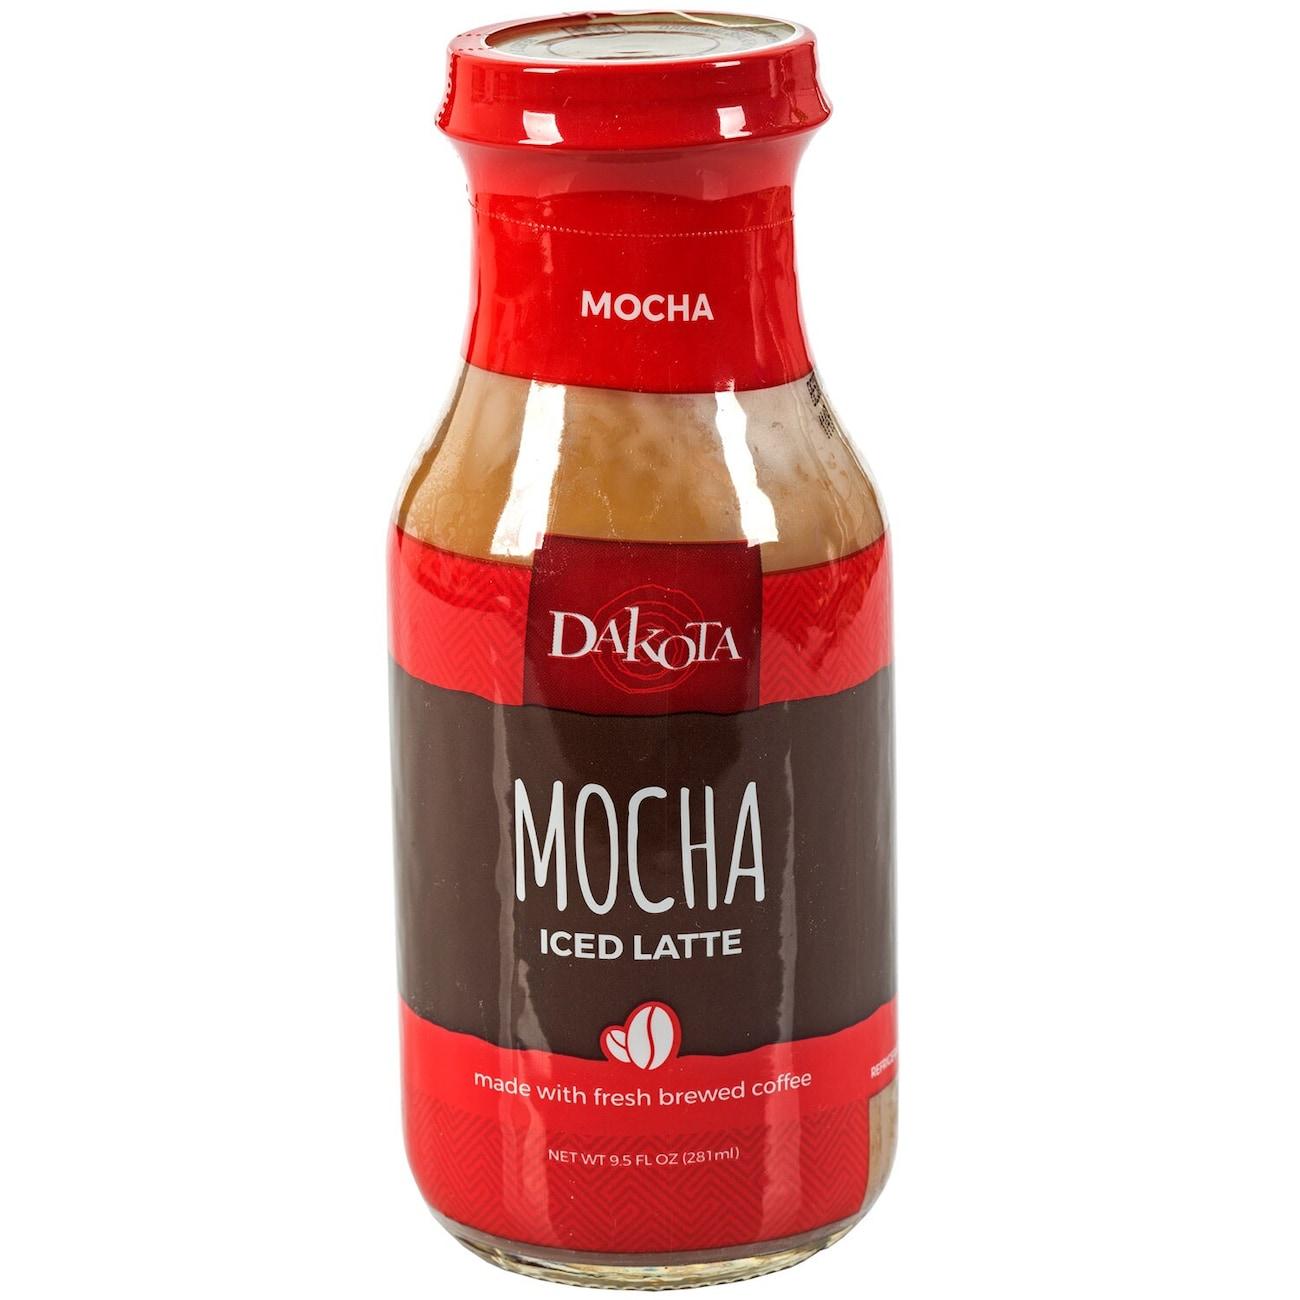 Dakota Mocha Iced Lattes, 9.5-oz. Bottles